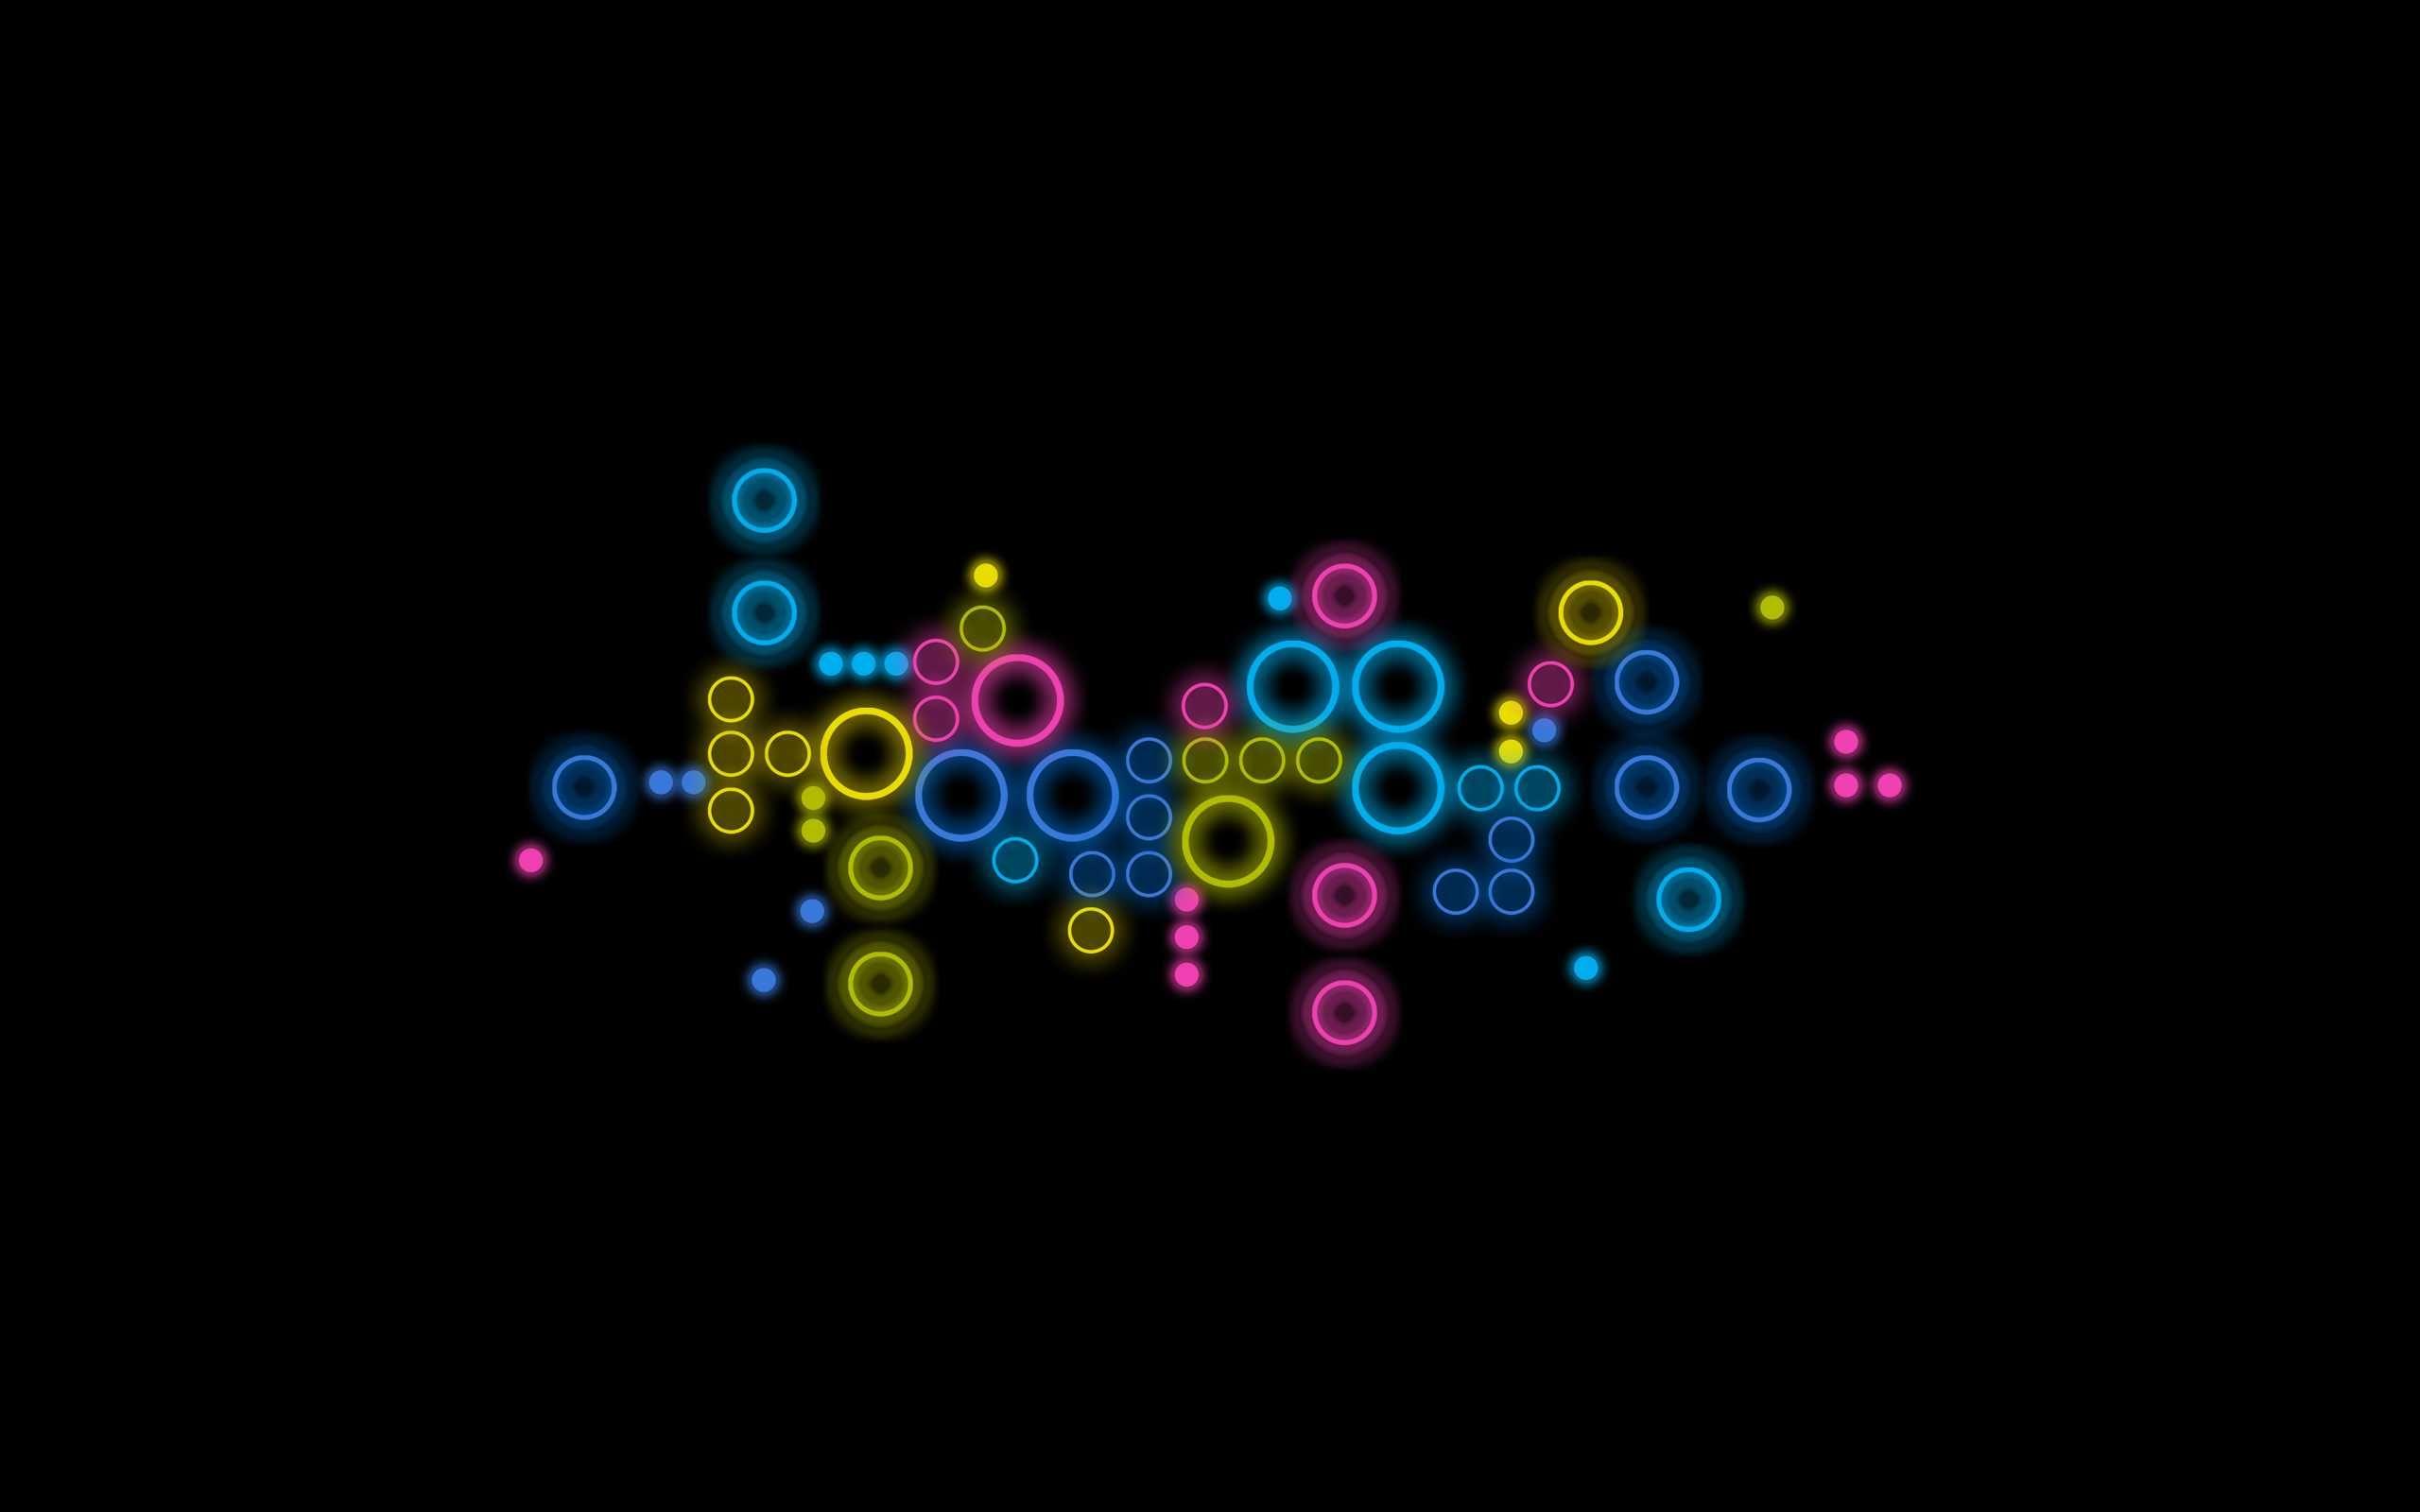 Wallpapers Musica Colorful Hd X Set En Descarga Directa